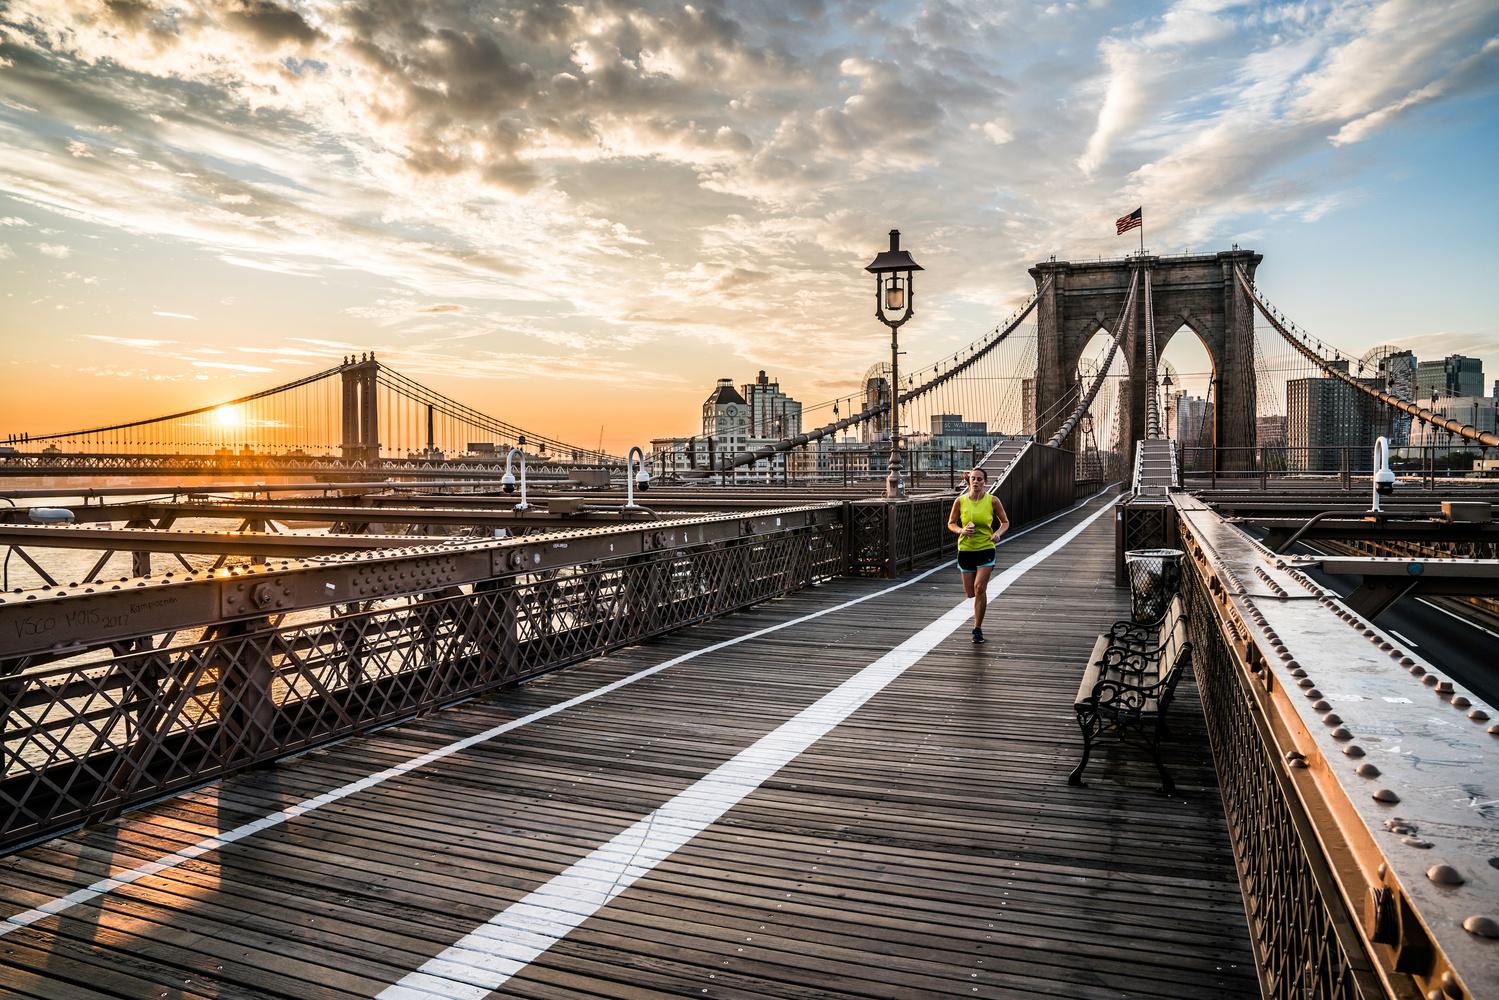 Run Brooklyn by Michael Giacobbe